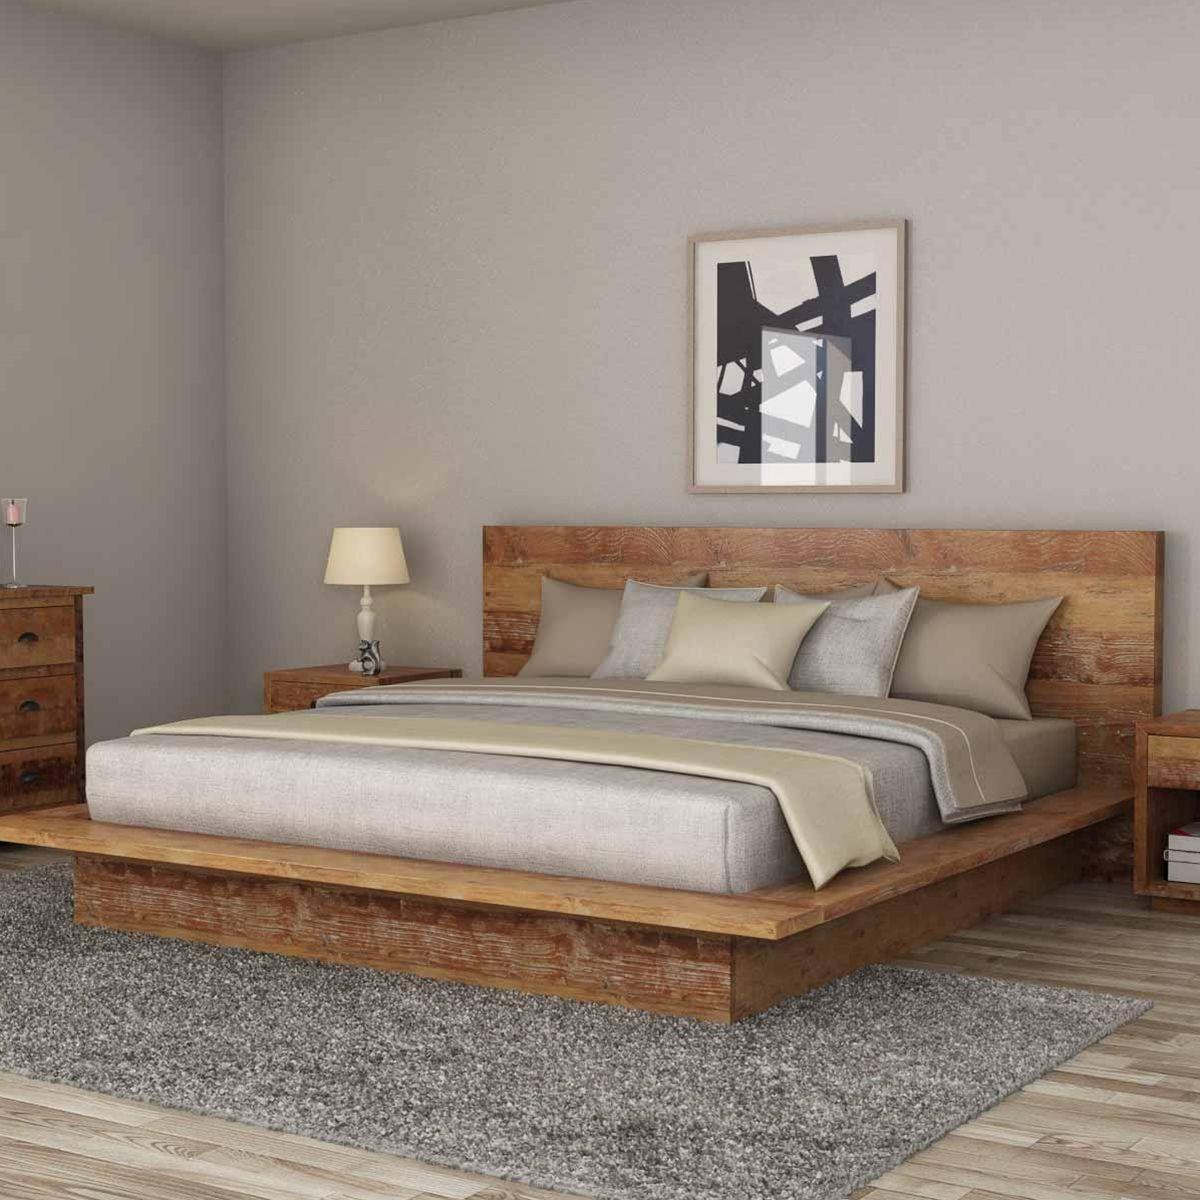 15 Perfect Diy Wood Pallet Crafts Platform Bed Designs Rustic